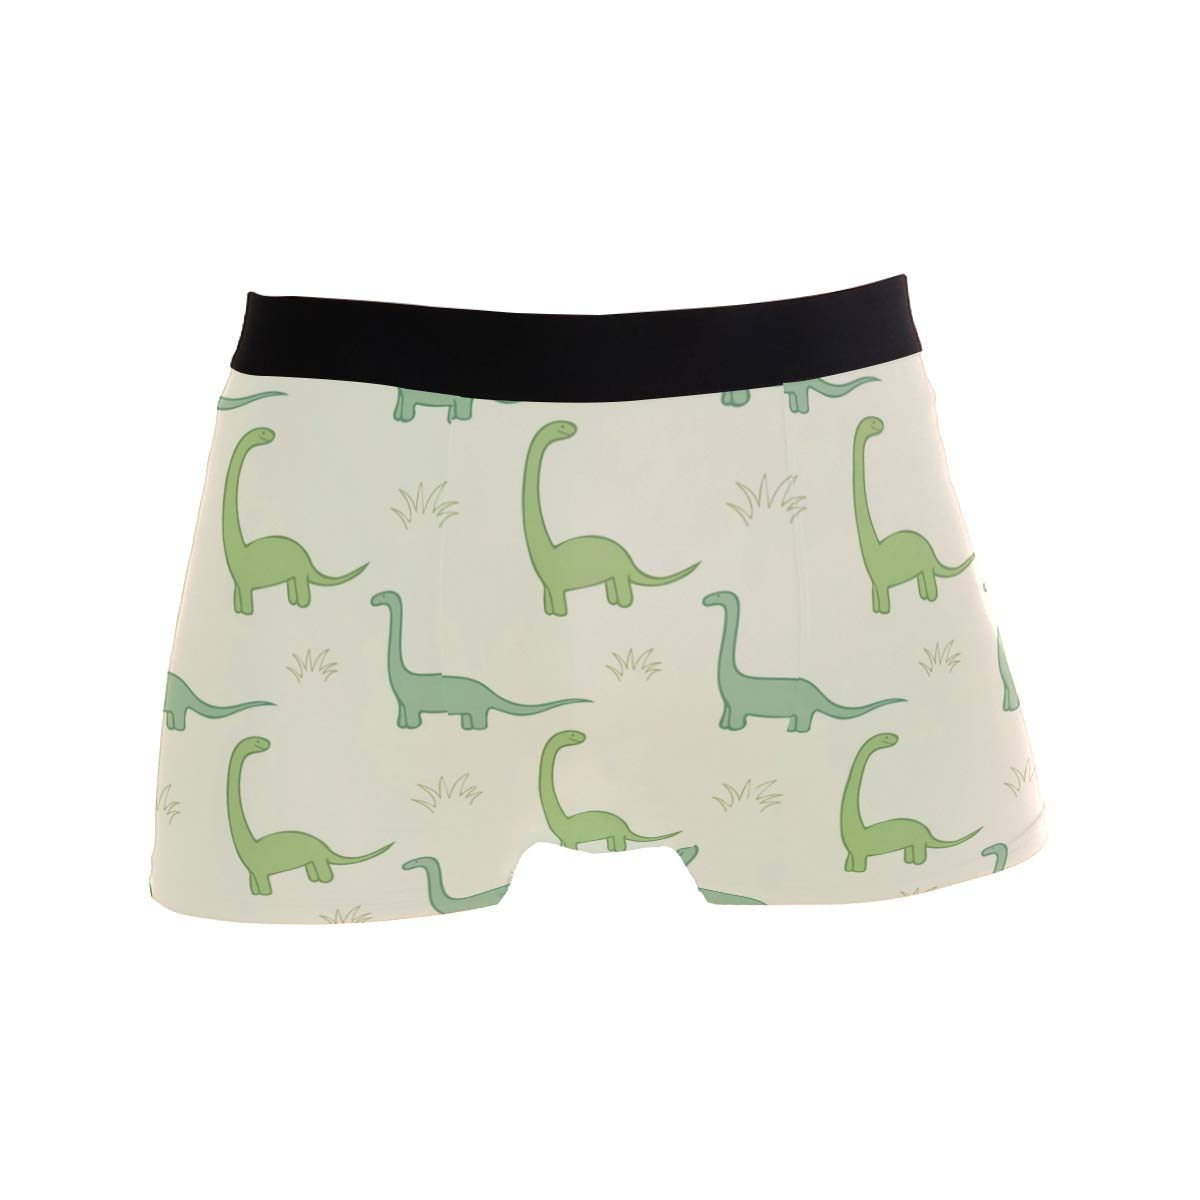 Mkuell Cute Dinosaur Comfortable Mens Boxer Briefs Multi-Size Soft Underwear S